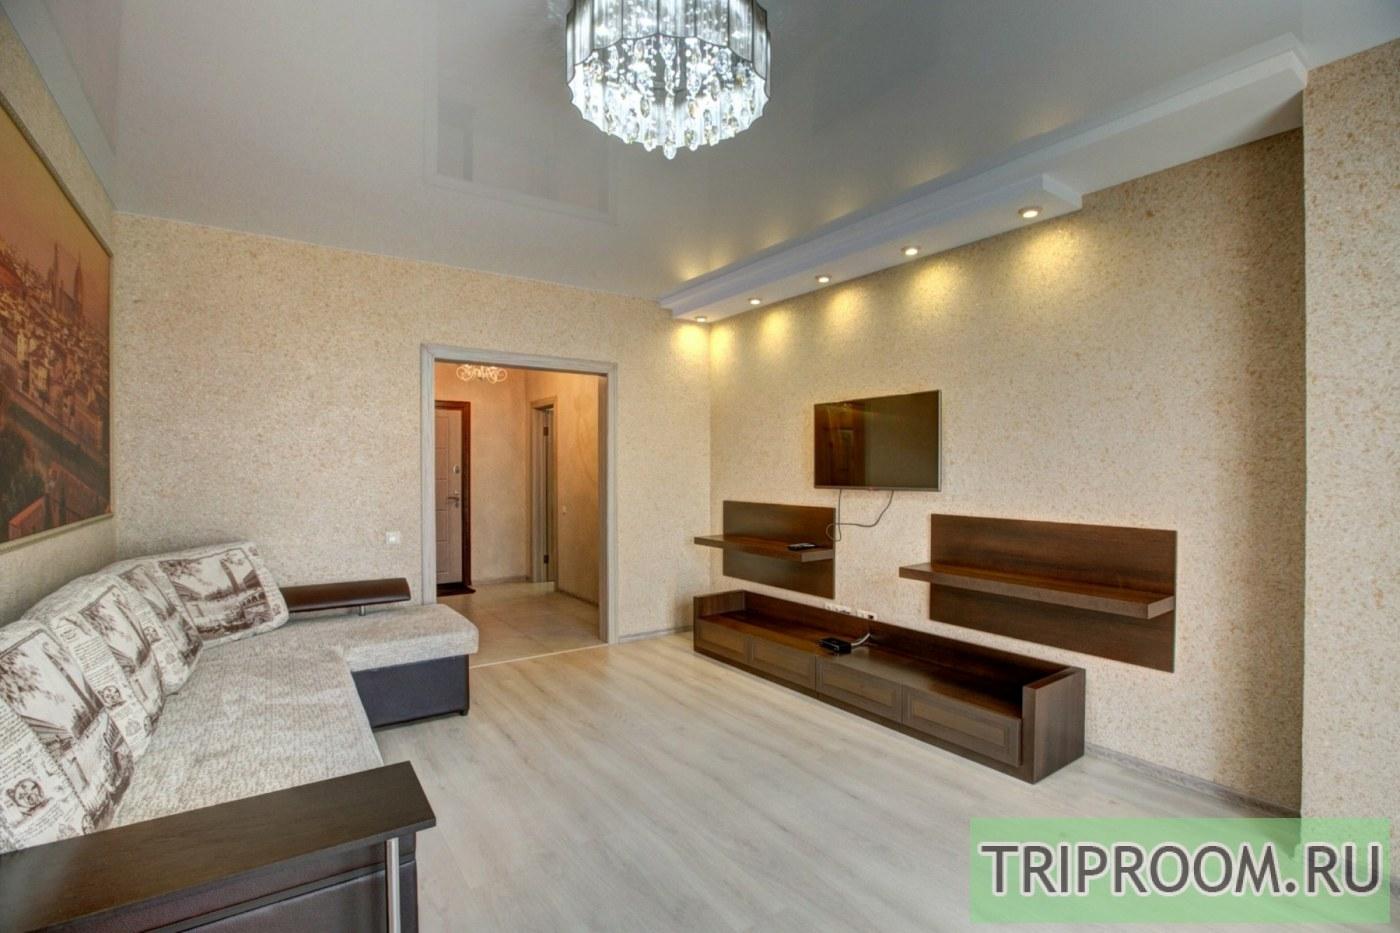 1-комнатная квартира посуточно (вариант № 38810), ул. Революции проспект, фото № 7